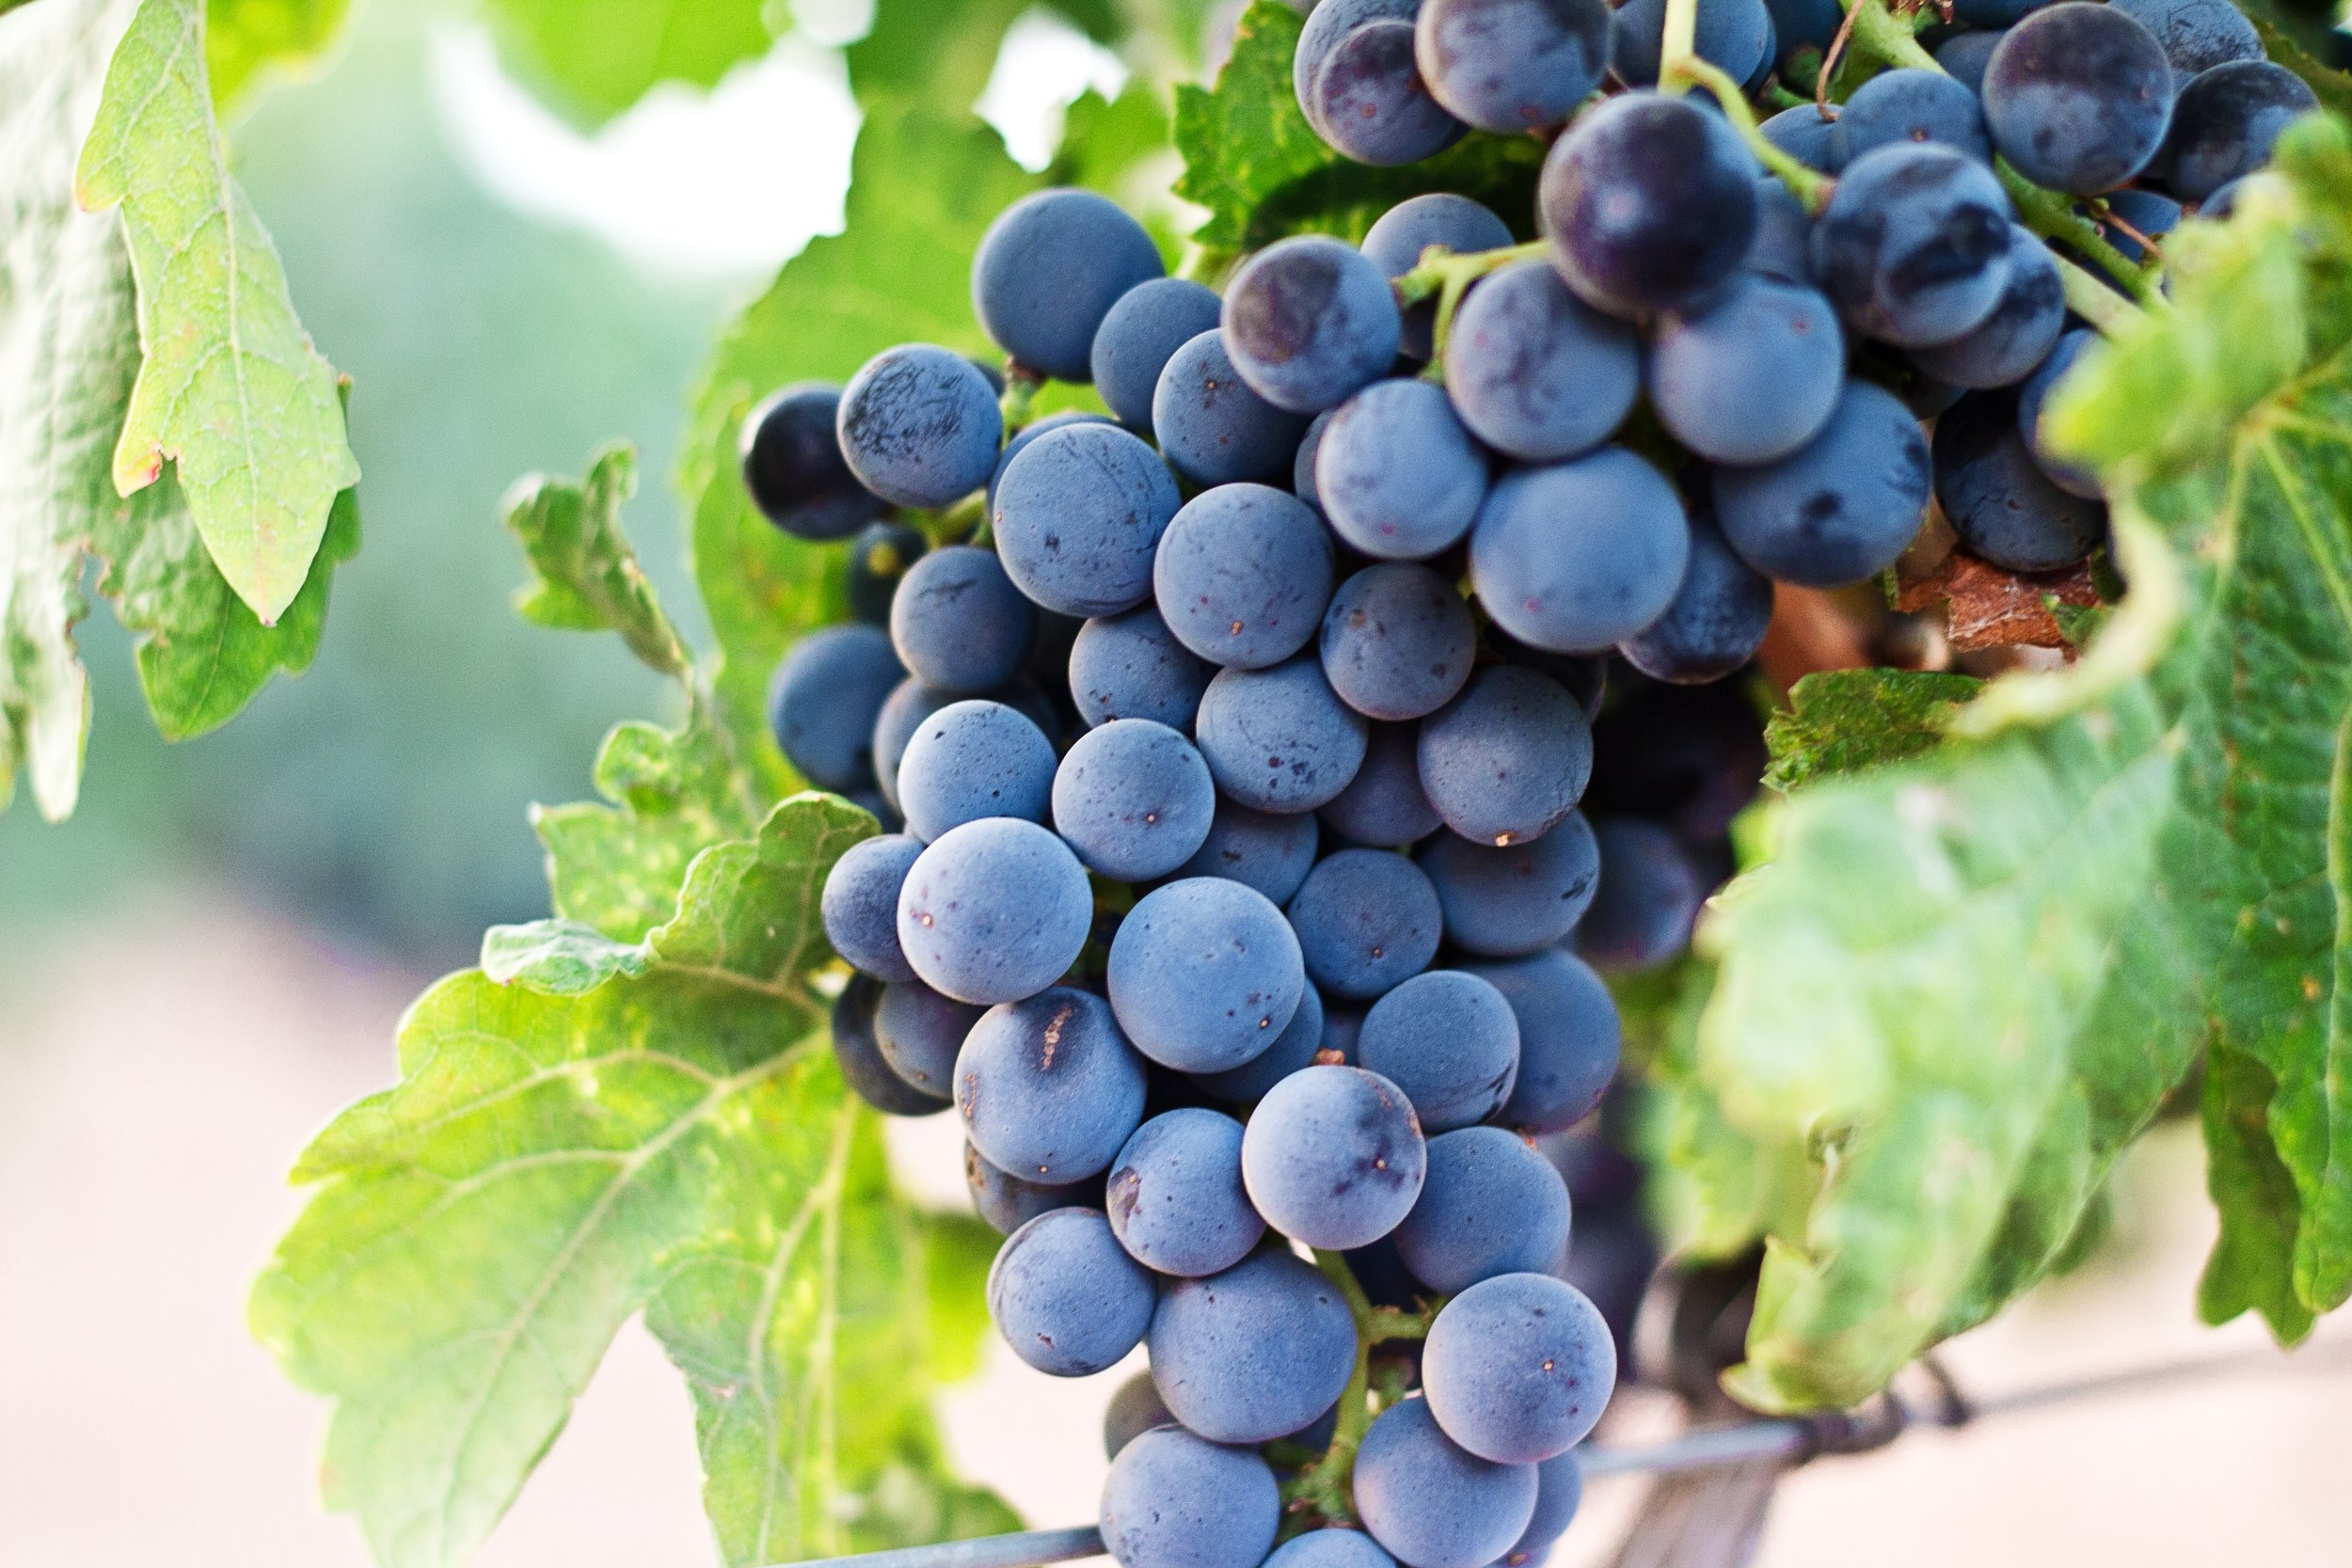 6. Grapes -